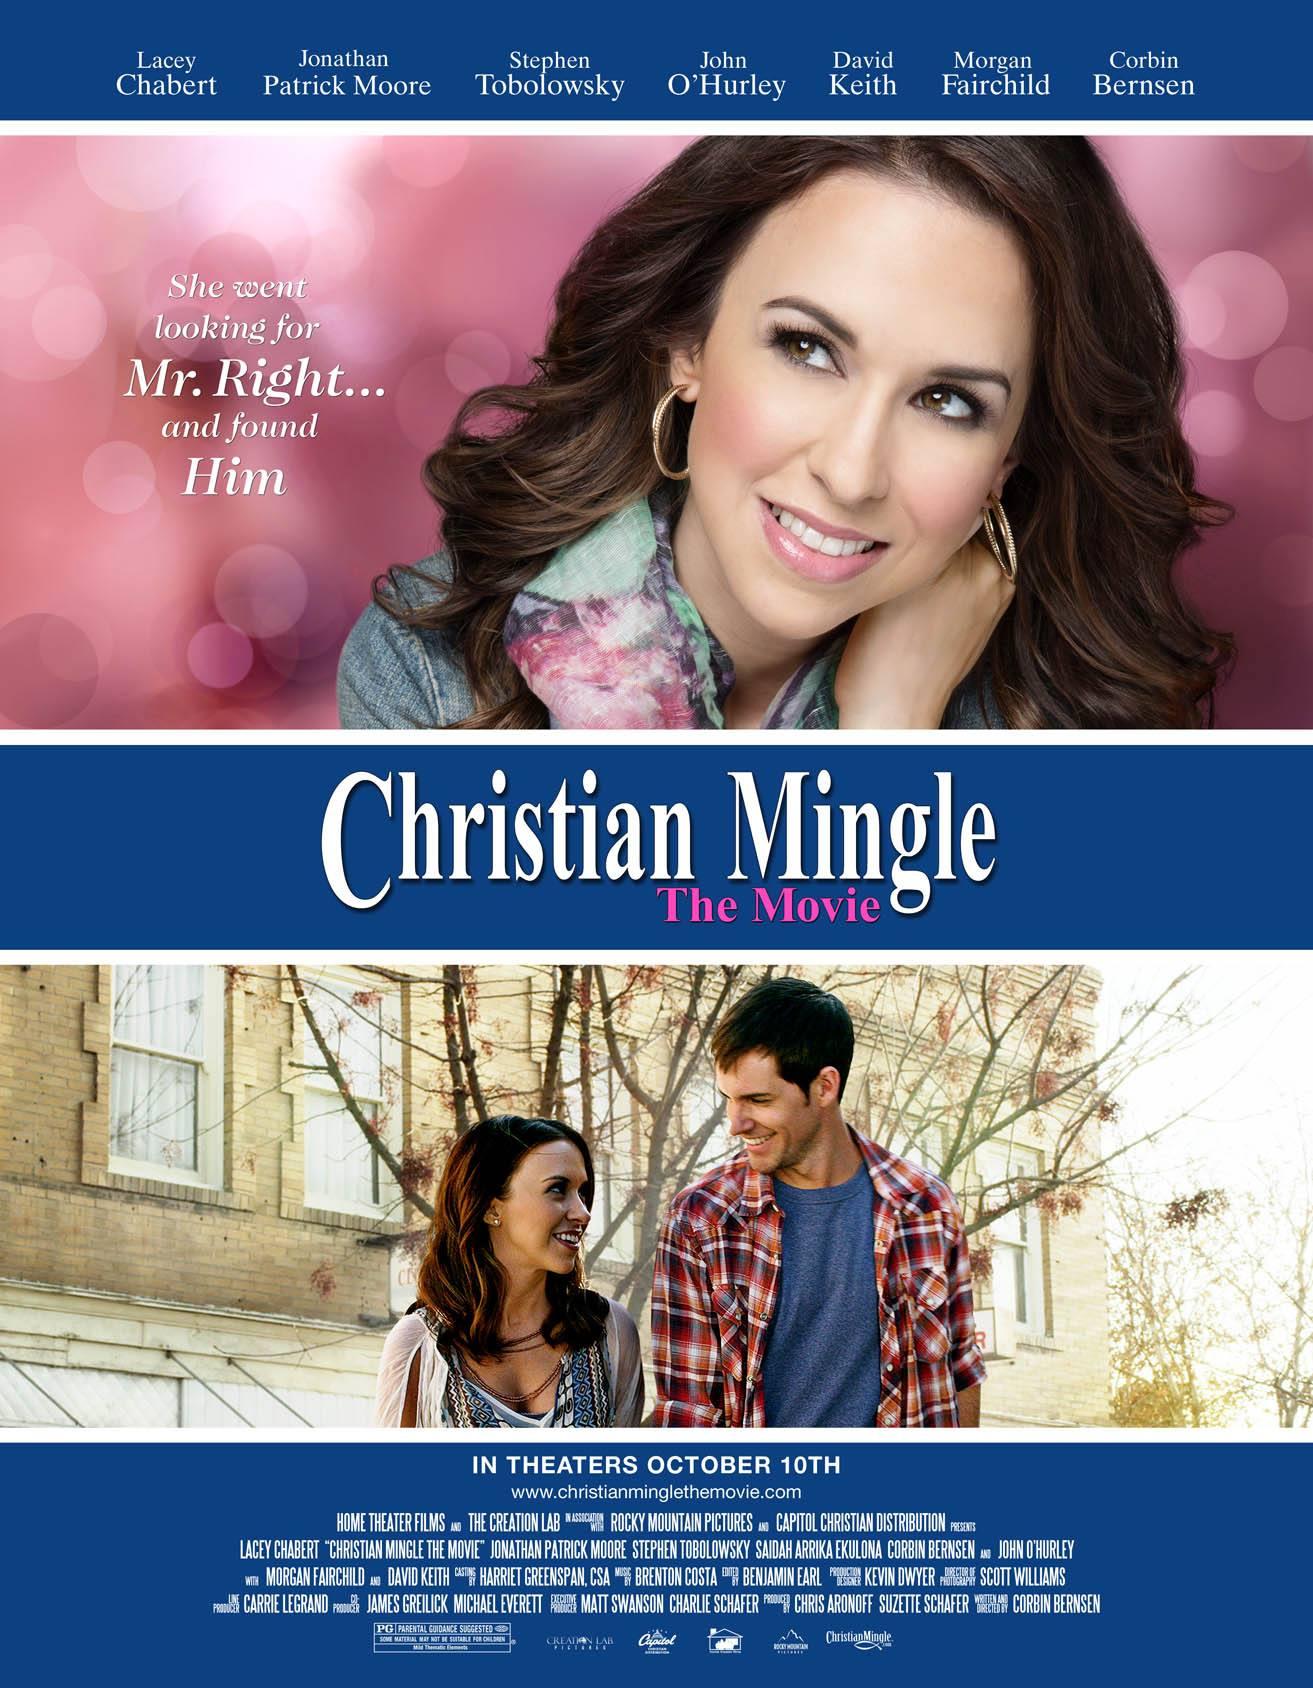 Lacey Chabert   Christian Mingle movie ad